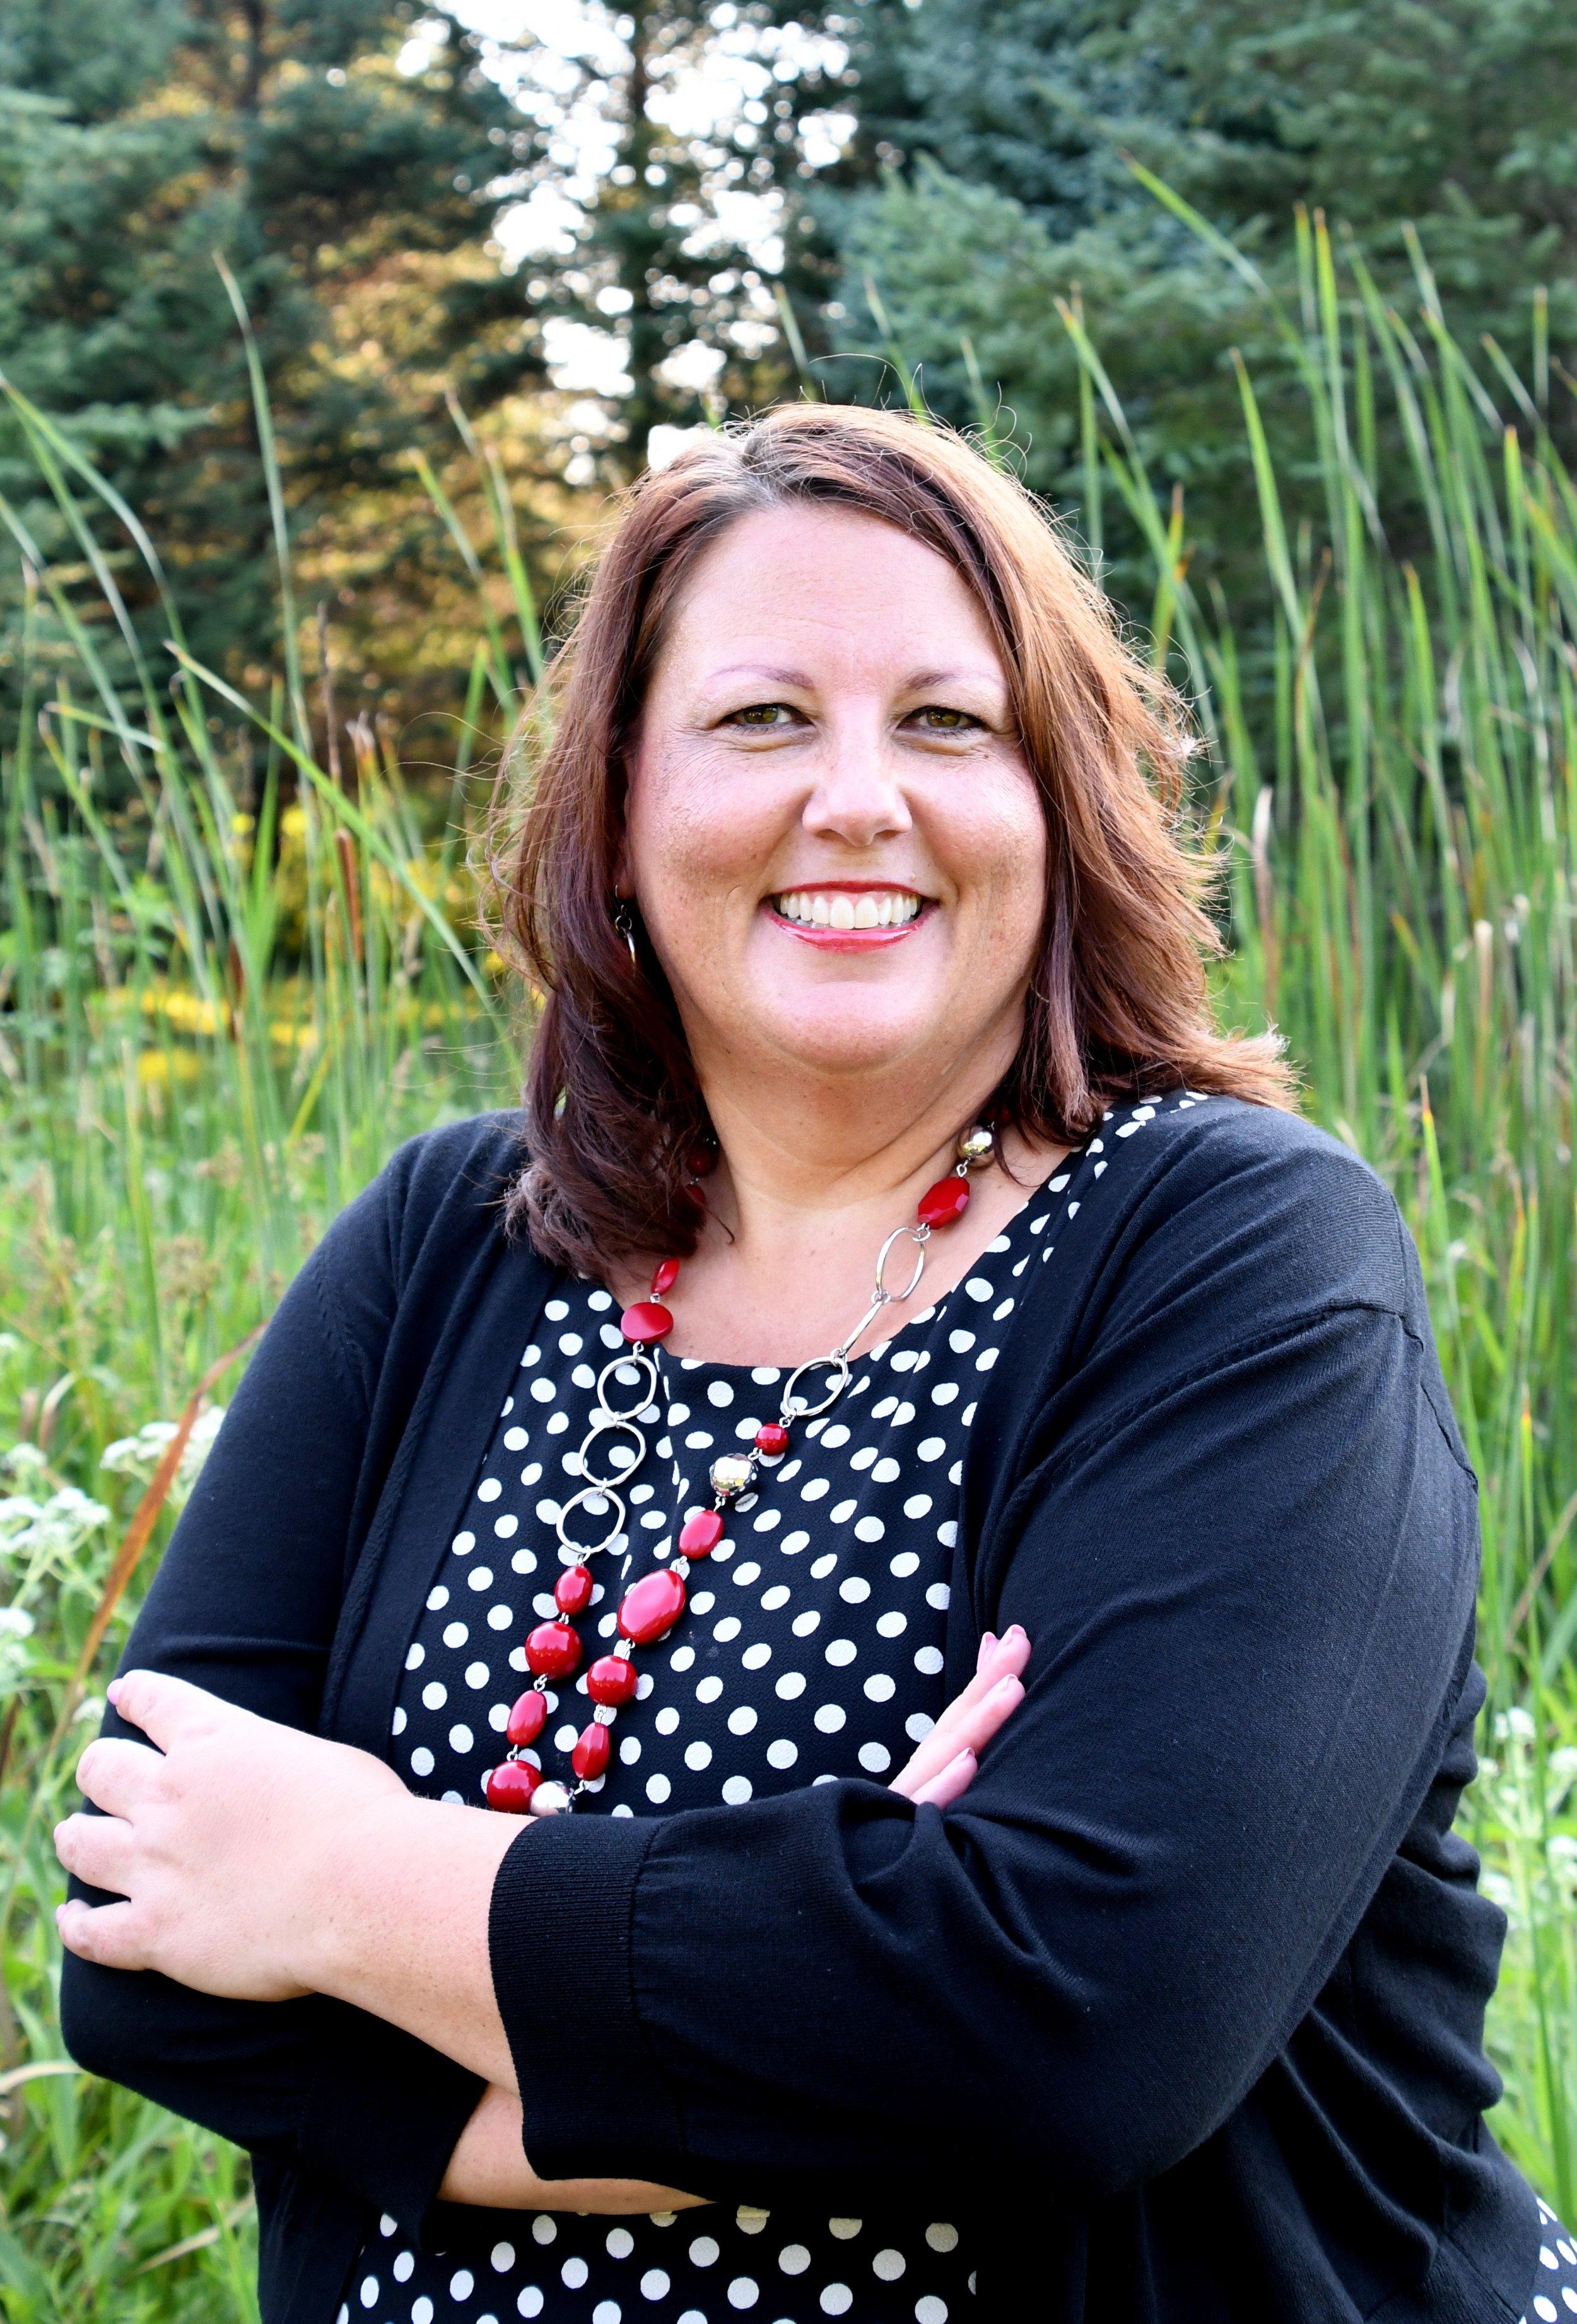 Juli McNeely, LUTCF, CFP, CLU, is president of McNeely Financial Services in Wisconsin